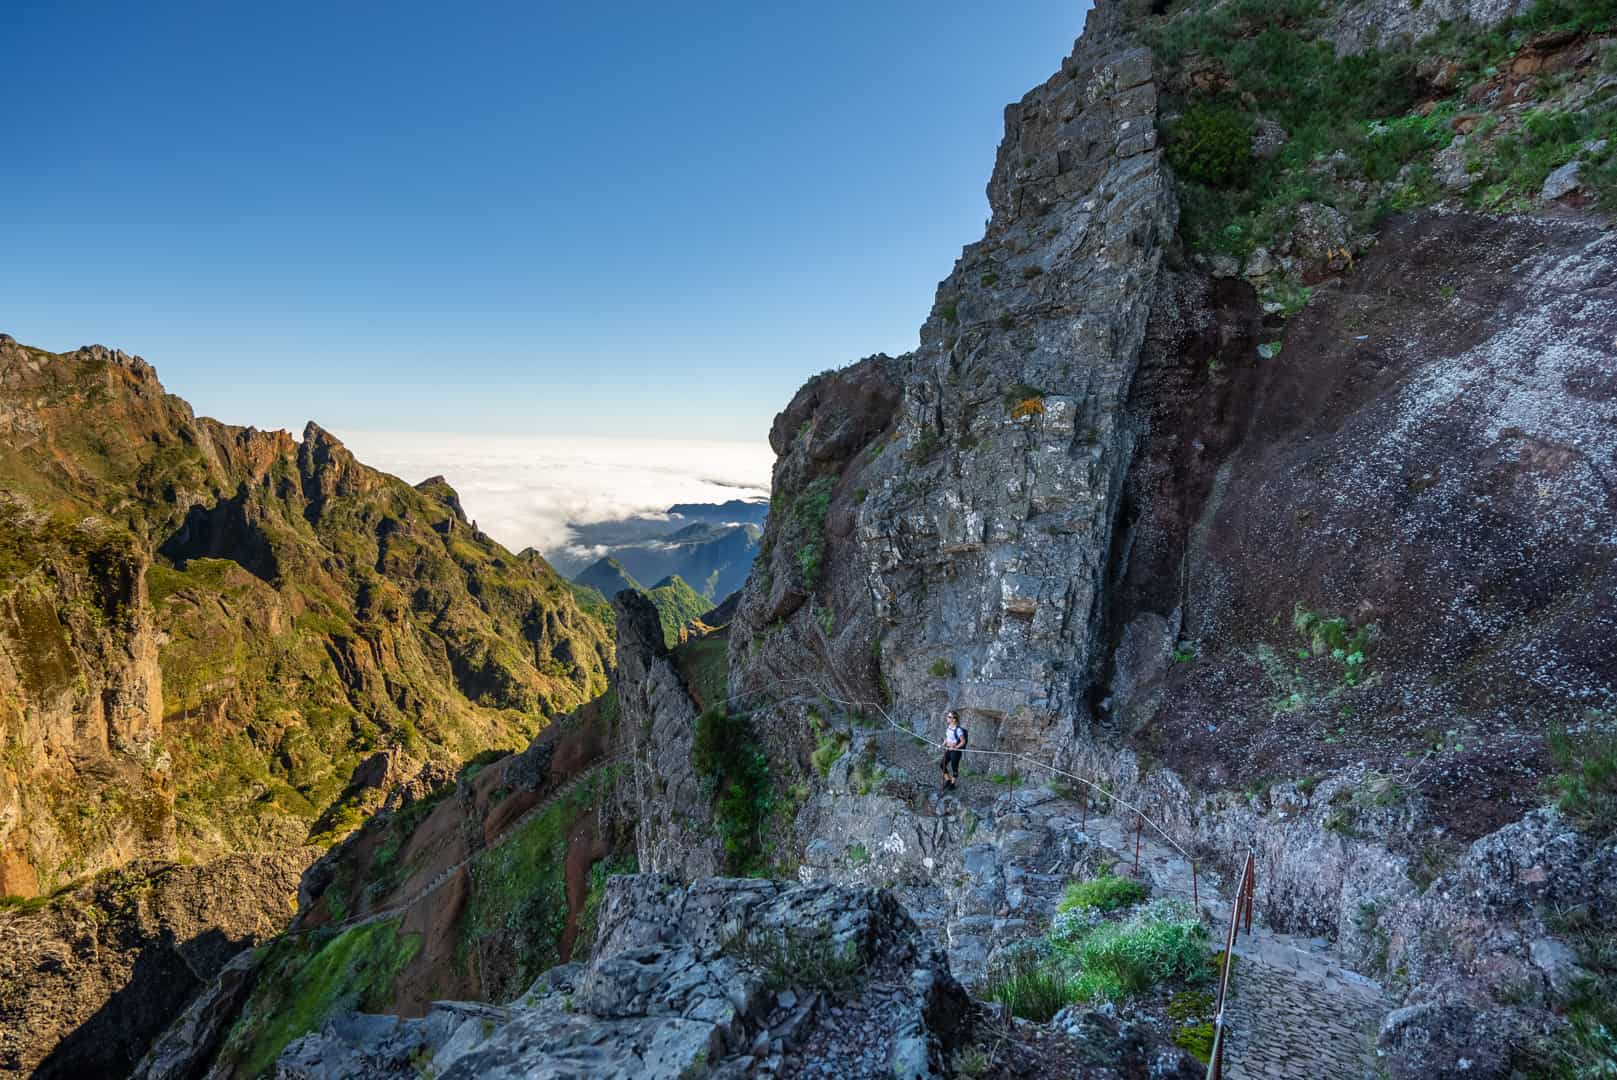 pico-arieiro-pico-ruivo-hike-mountains-ocean-view